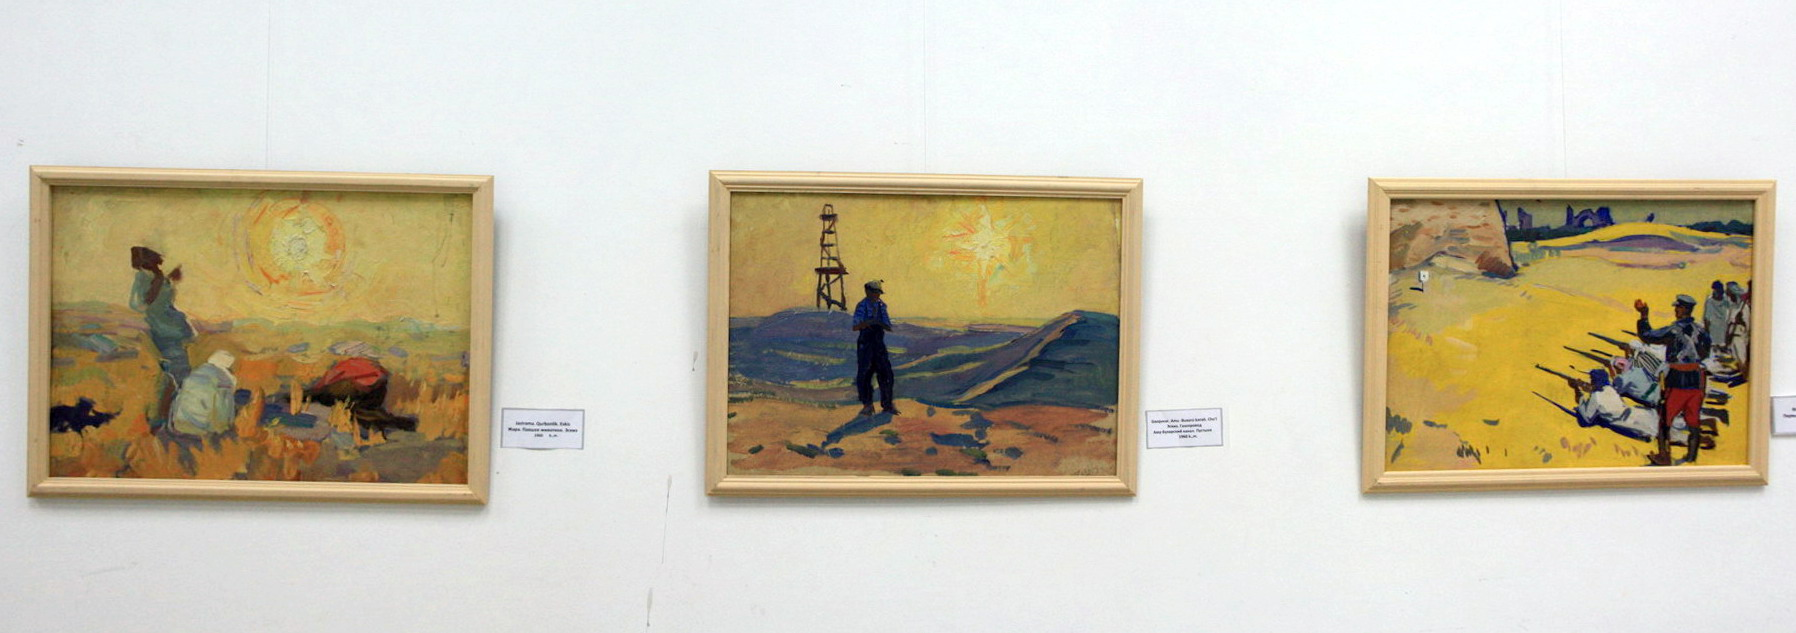 Григорий Улько. Экспозиция картин.